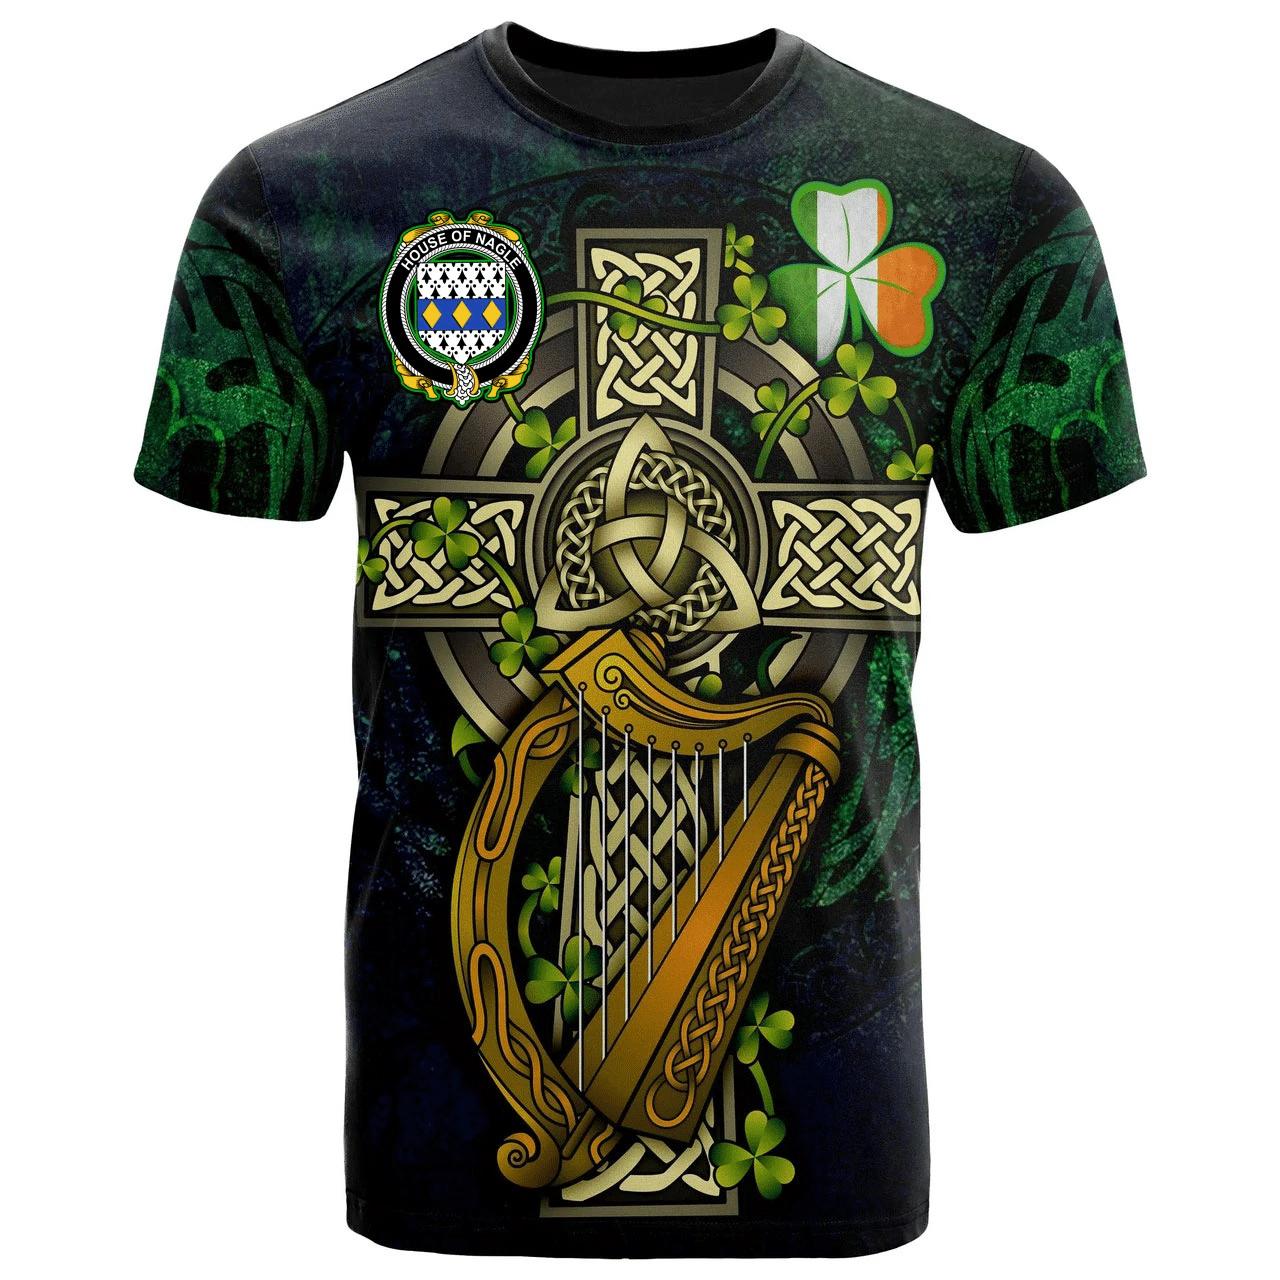 1sttheworld Ireland T-Shirt - House of NAGLE Irish Family Crest and Celtic Cross A7